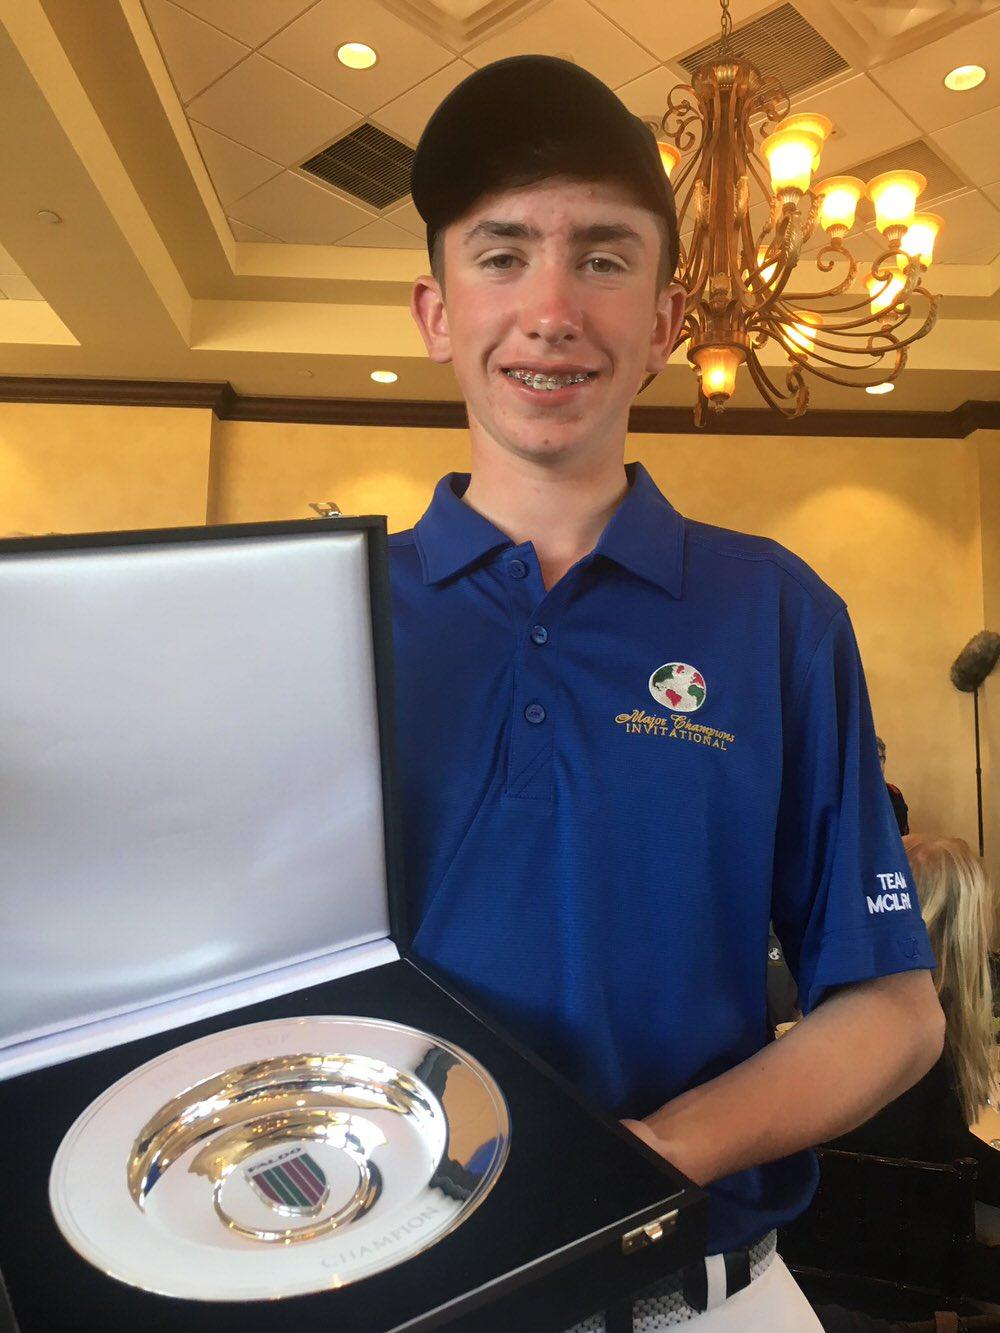 Tom McKibbin with the trophy